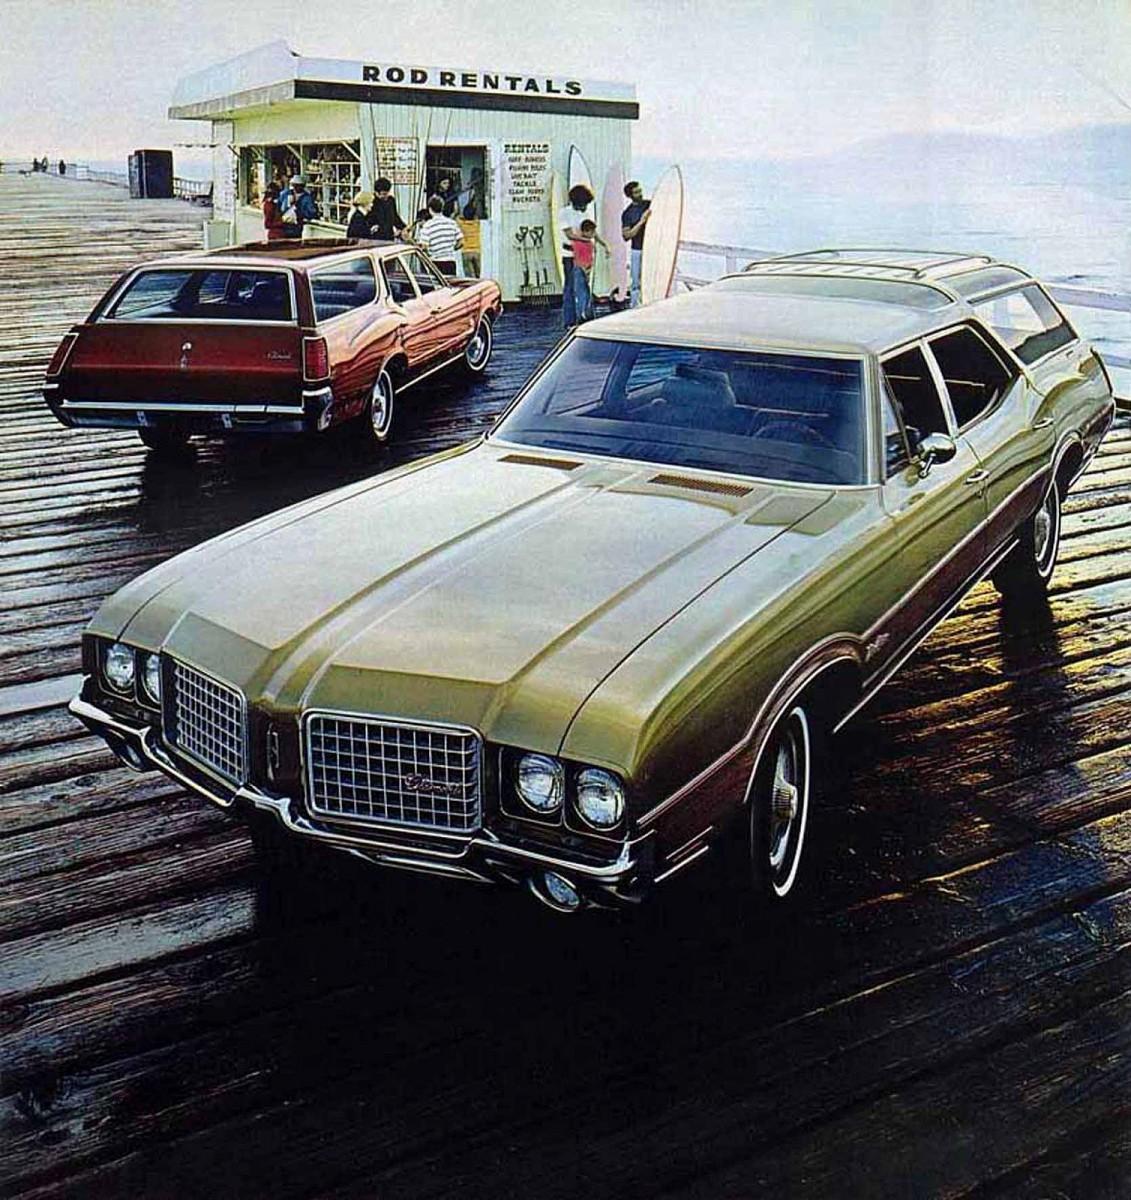 1993 Oldsmobile Cutlass Cruiser Camshaft: Automotive History And QOTD: The American Wagons Of 1972